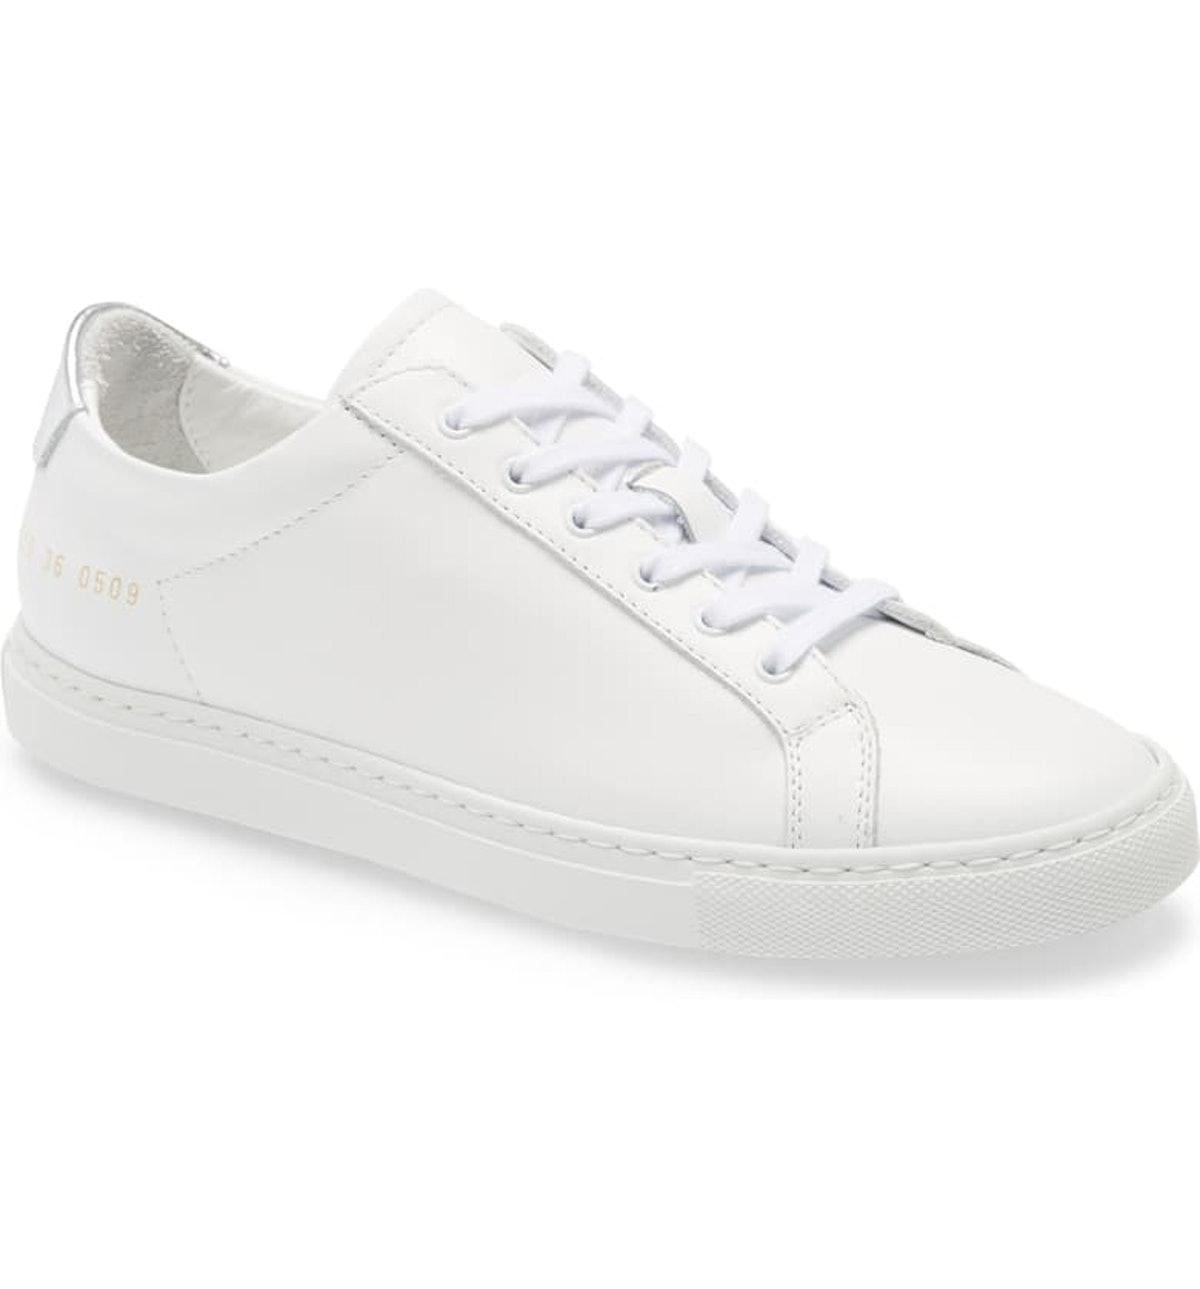 Retro Low Top Sneaker